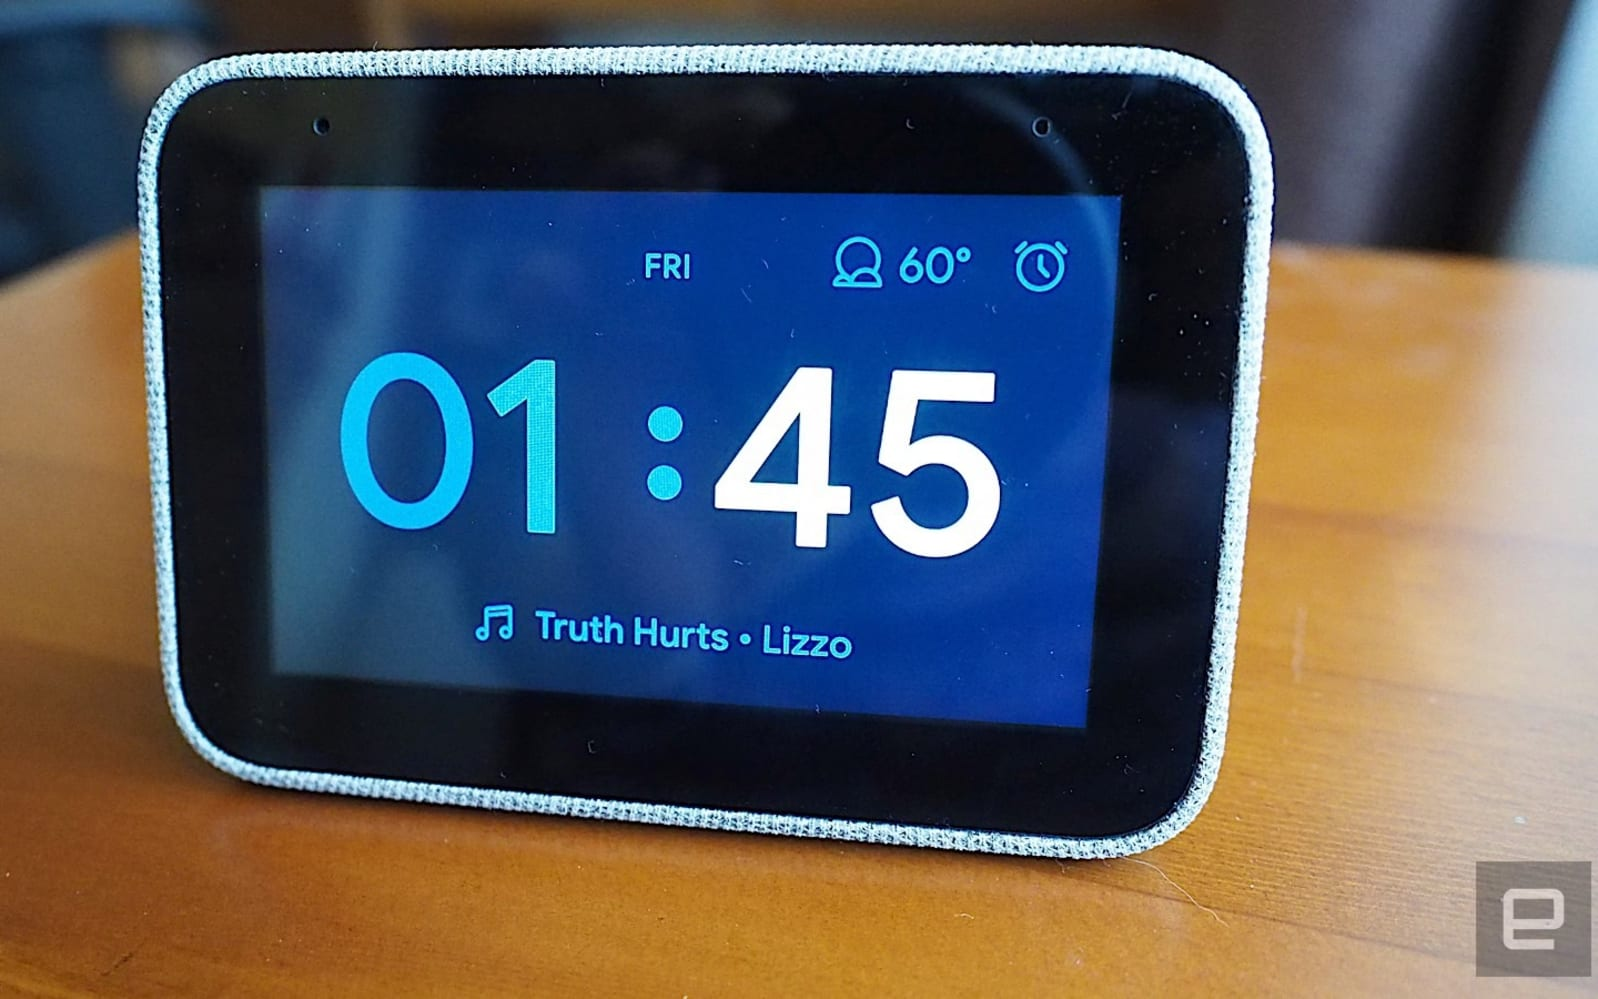 Lenovo's Smart Clock becomes a more capable home hub